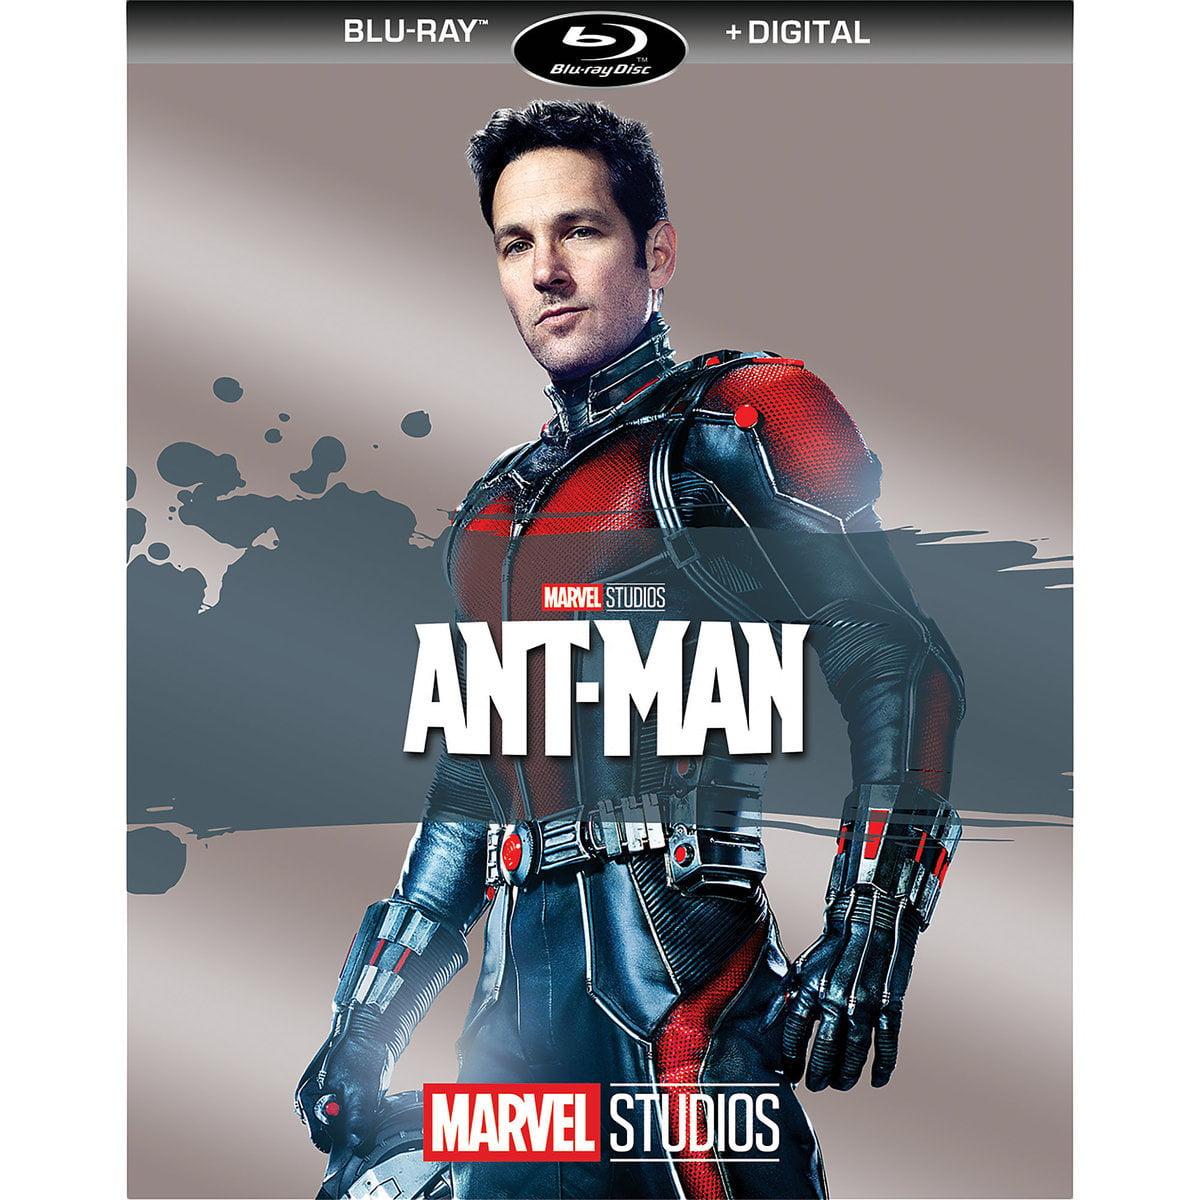 ant man blu ray digital walmart com